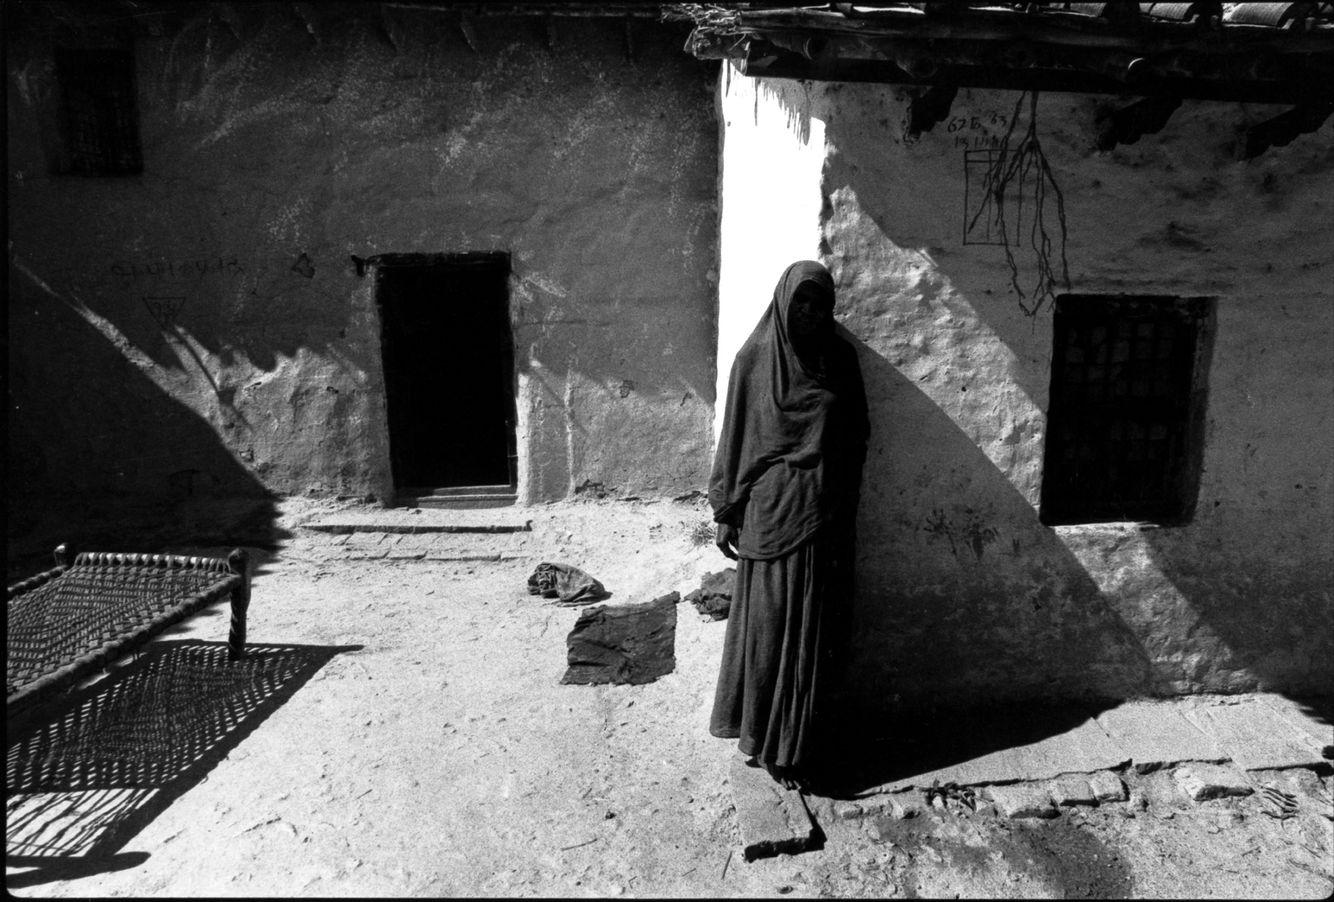 INDIA village woman8bit.jpg